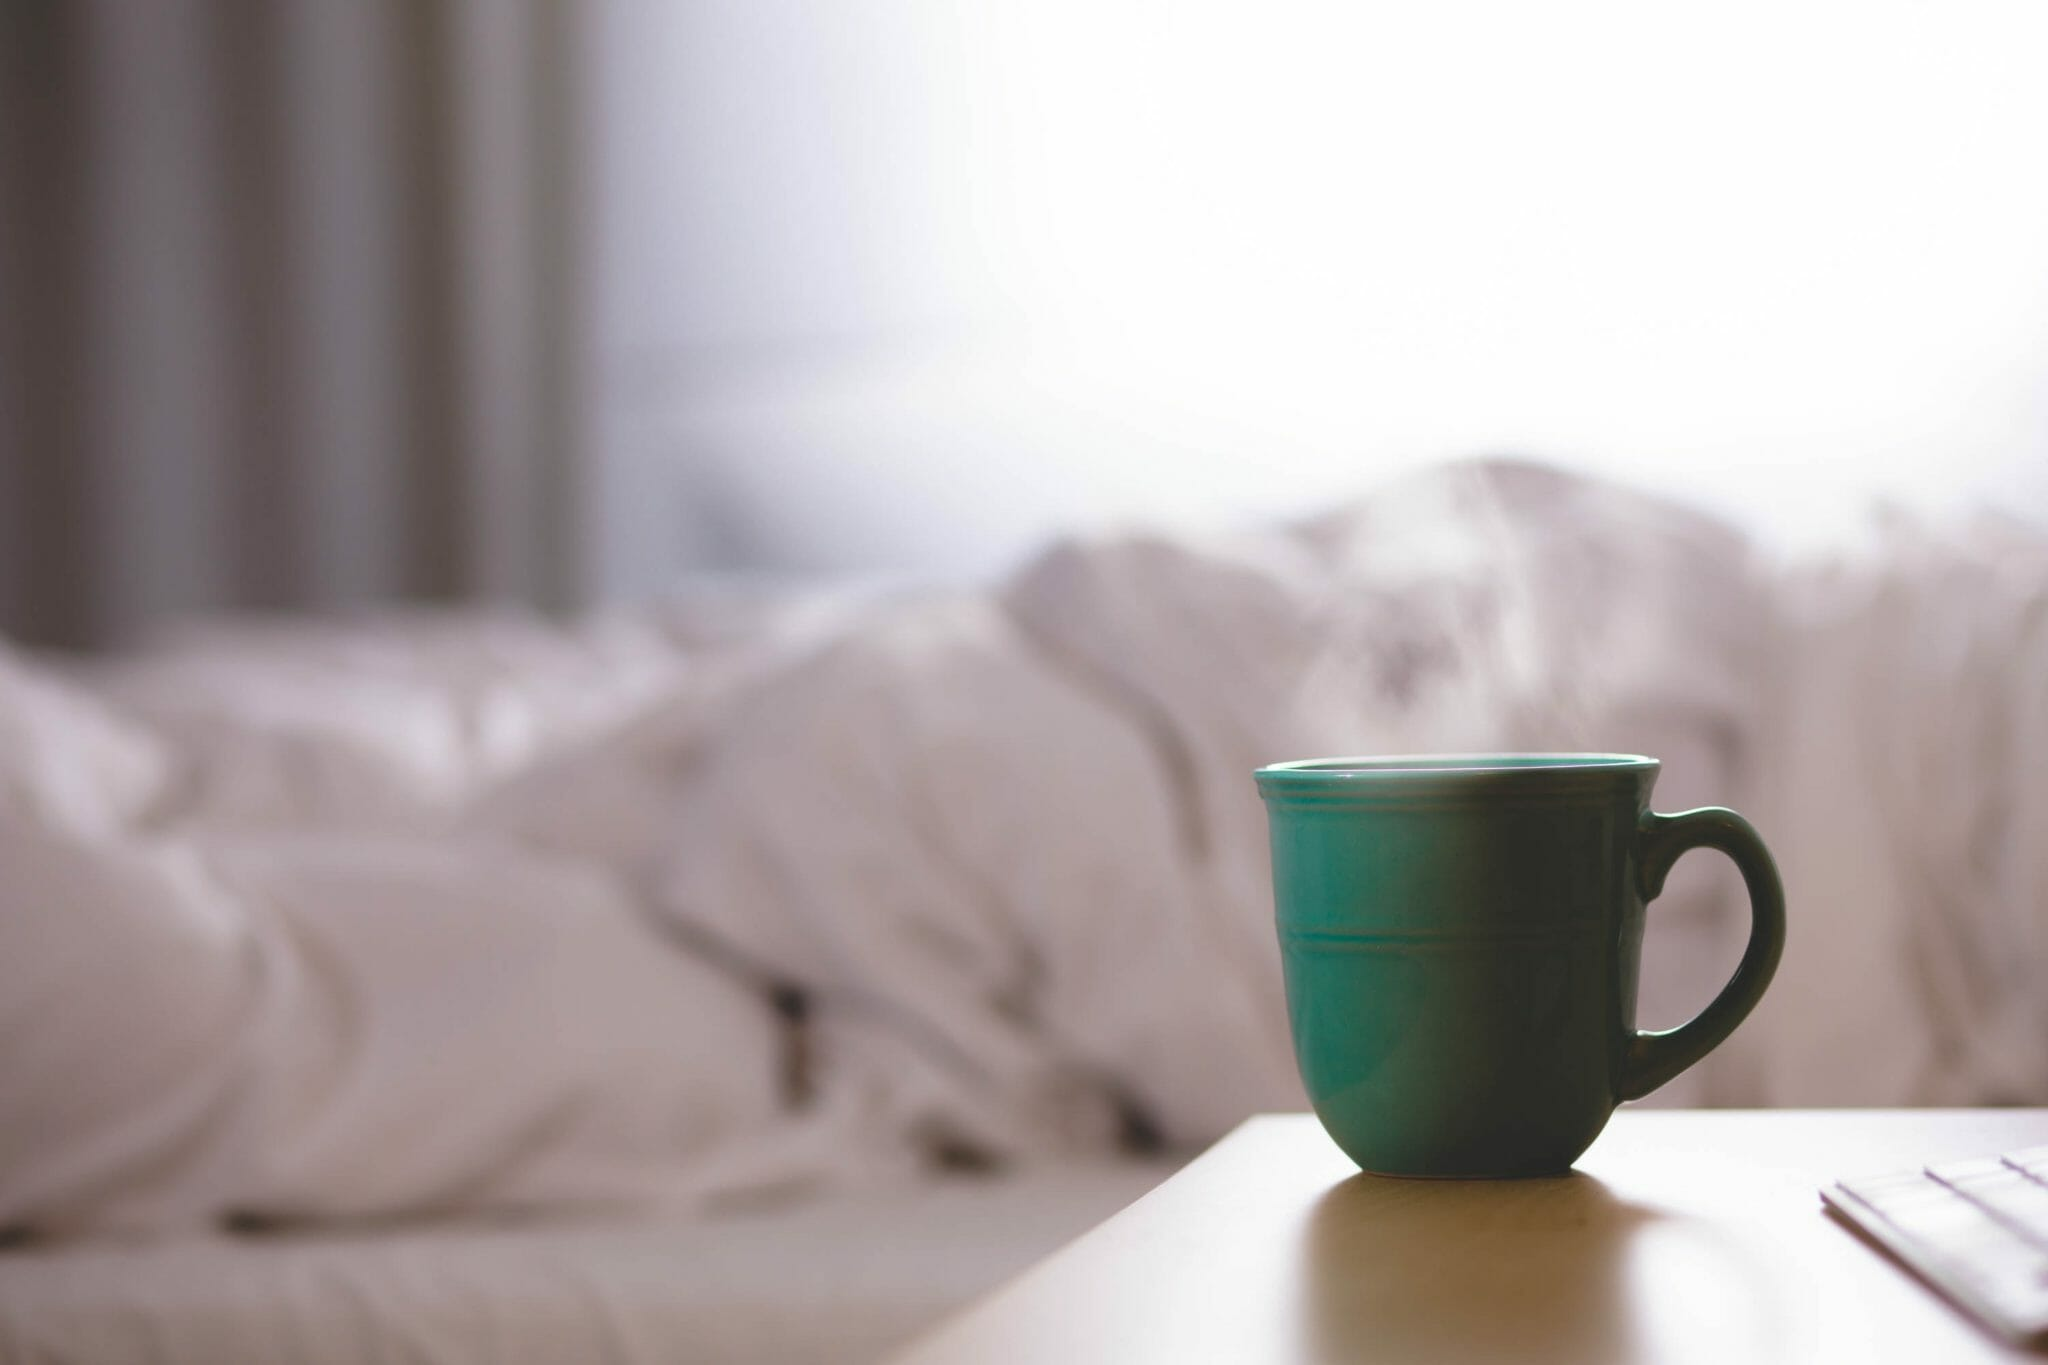 Mug on table next to bed|||